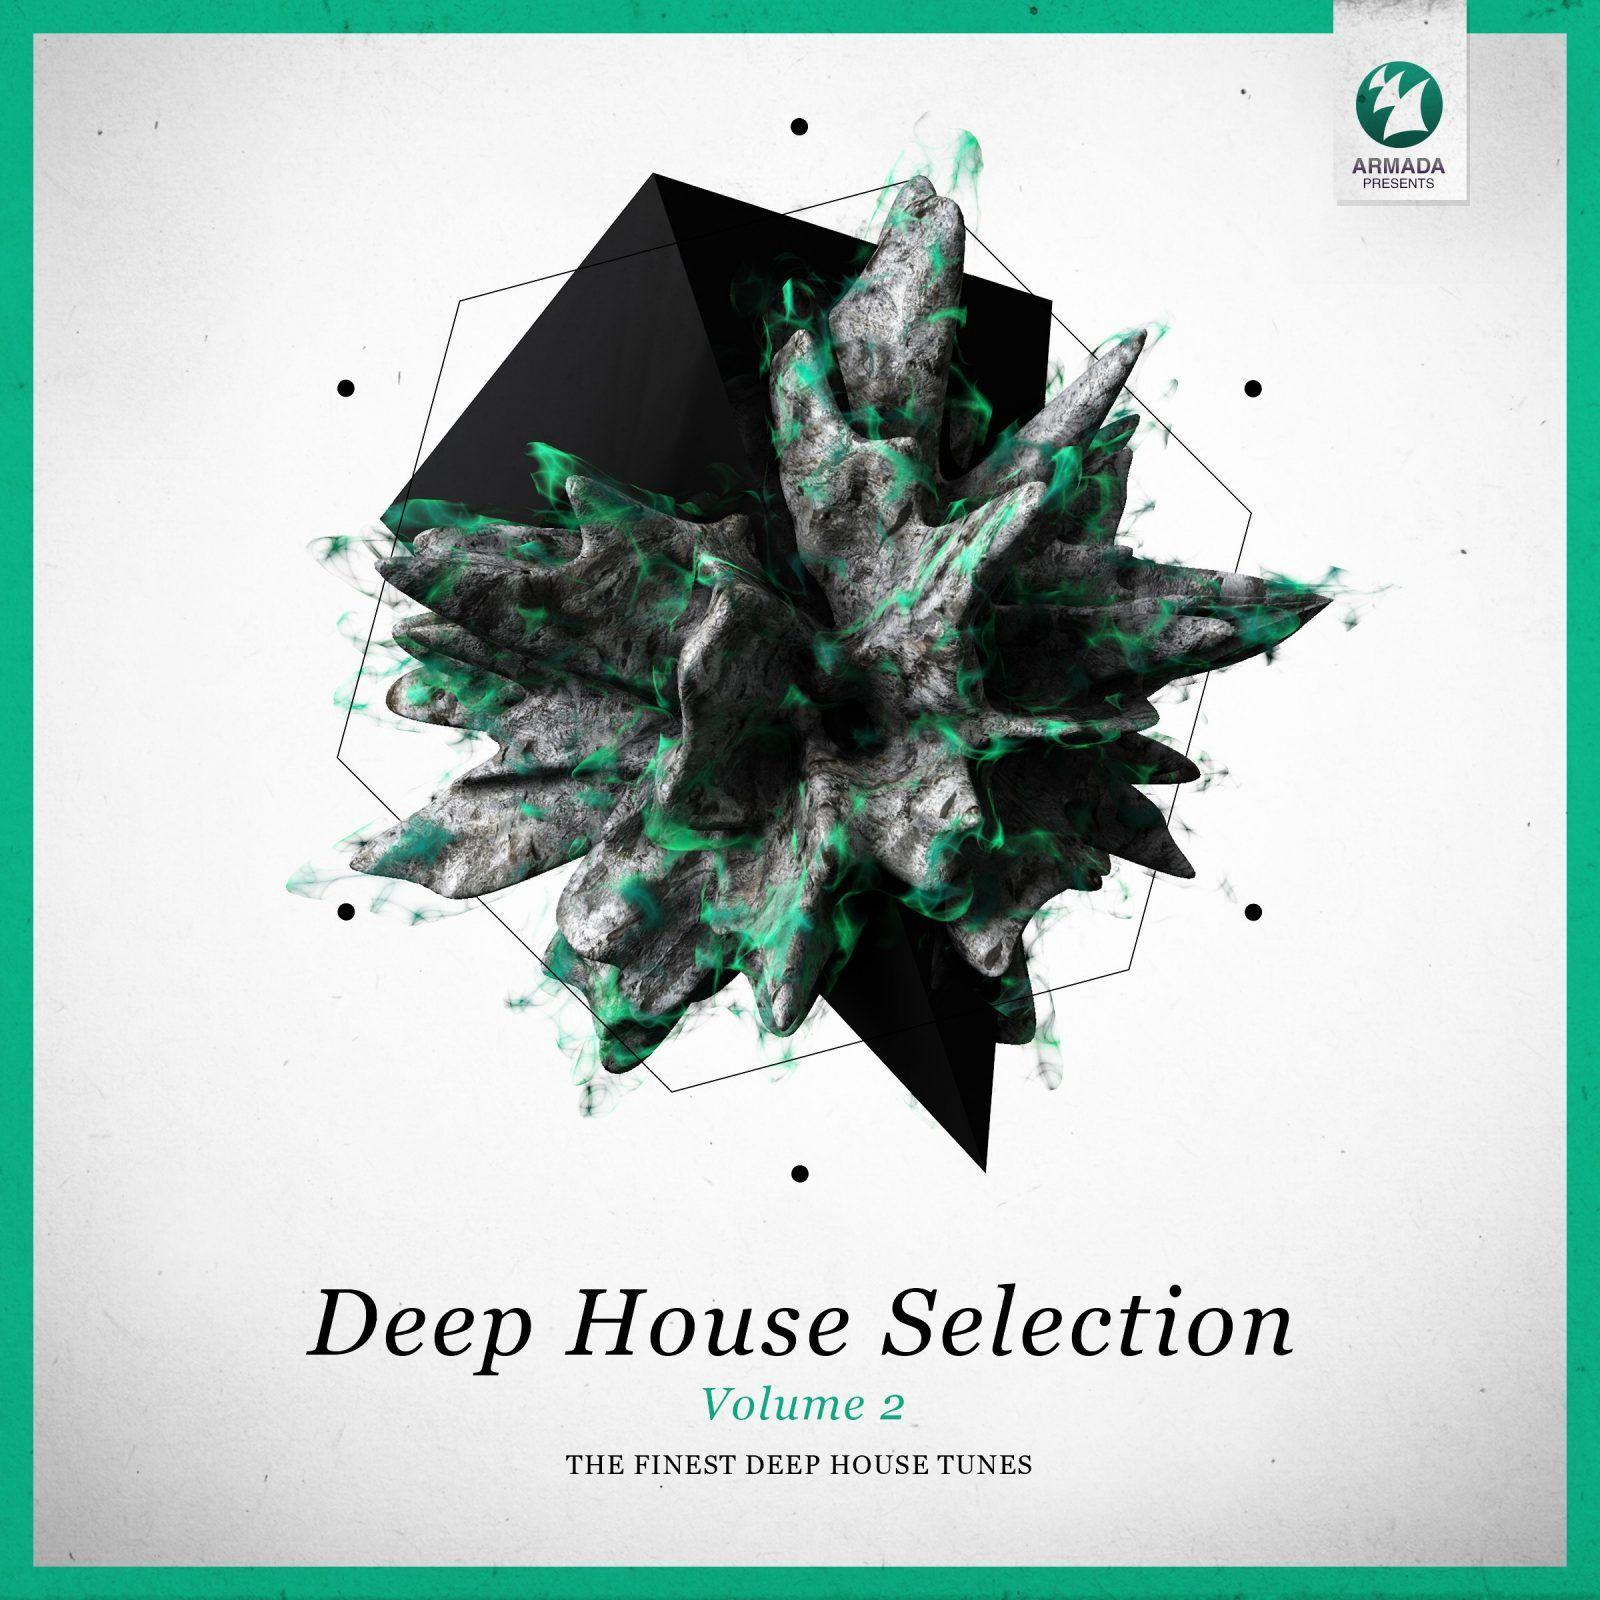 ardi3458-various-artists-armada-deep-house-selection-volume-2-finest-deep-house-tunes.jpeg